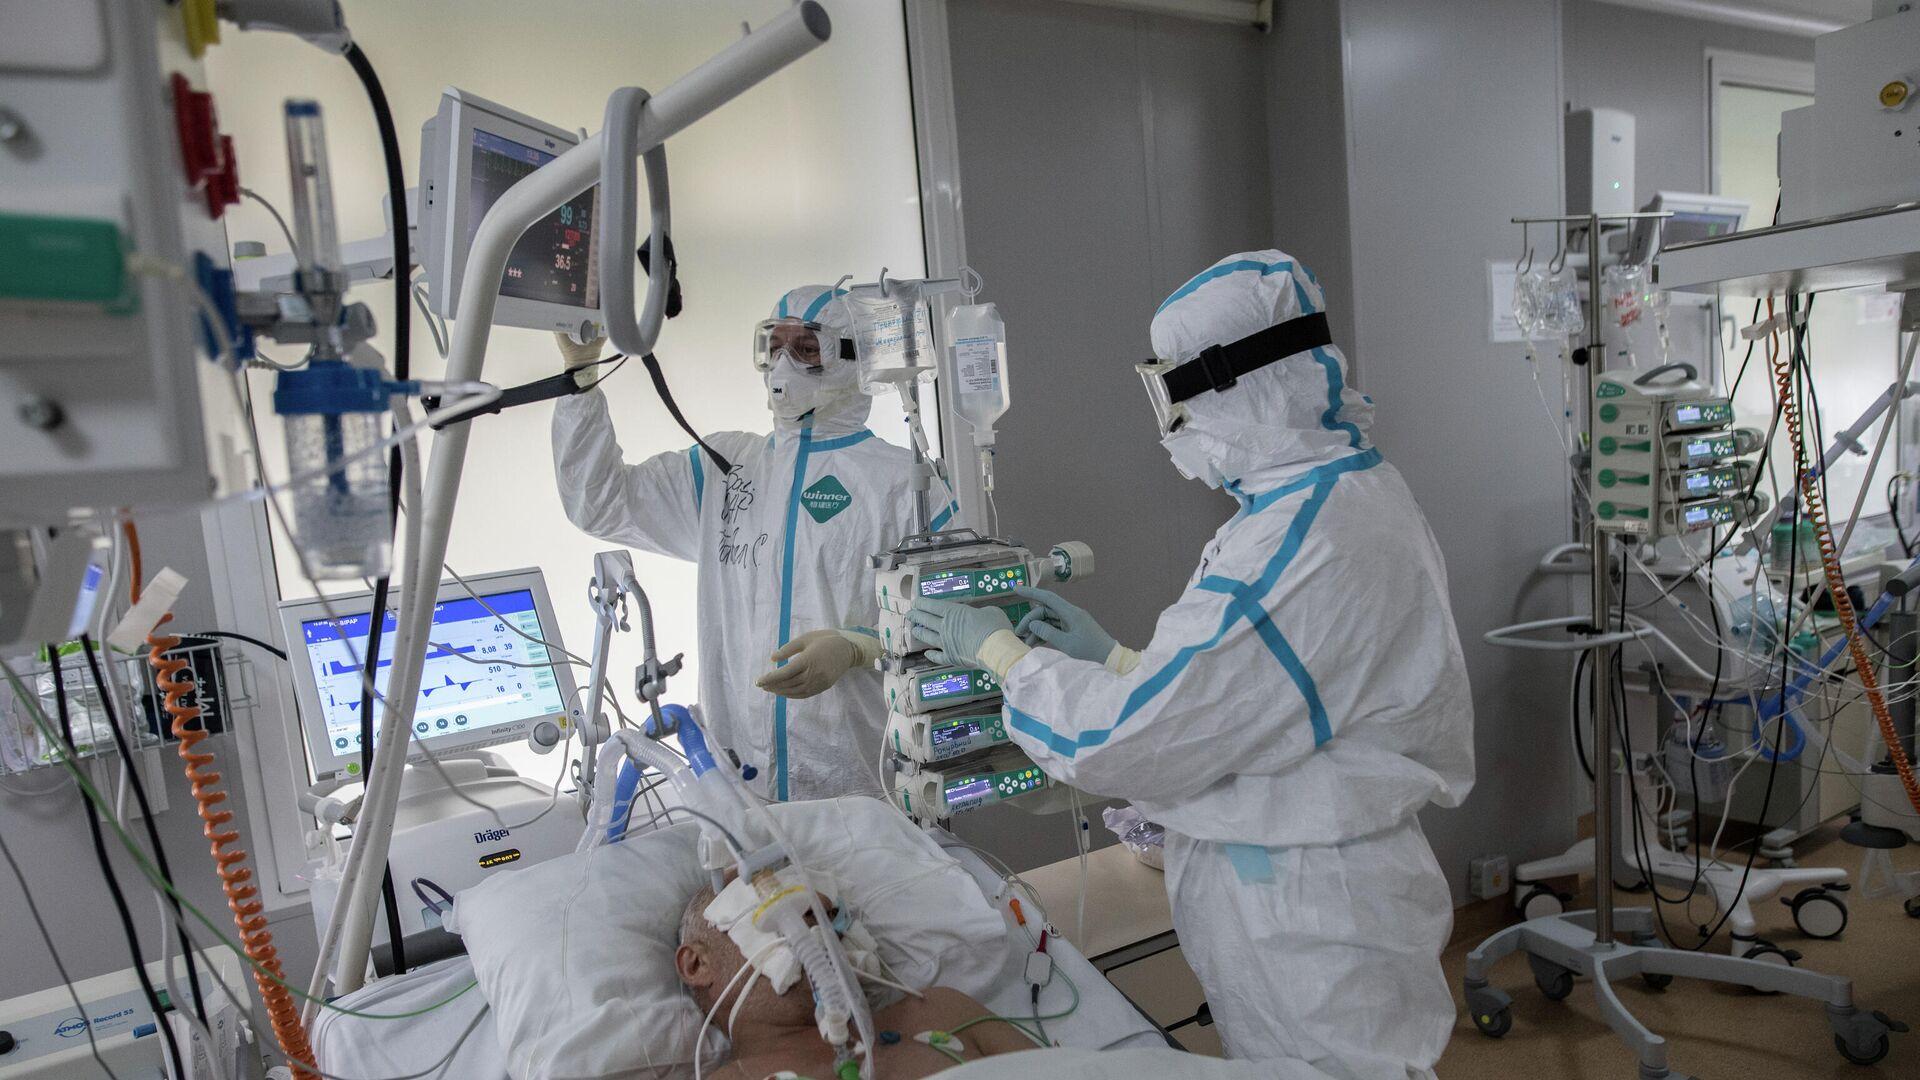 Paziente in terapia intensiva - Sputnik Italia, 1920, 30.09.2021